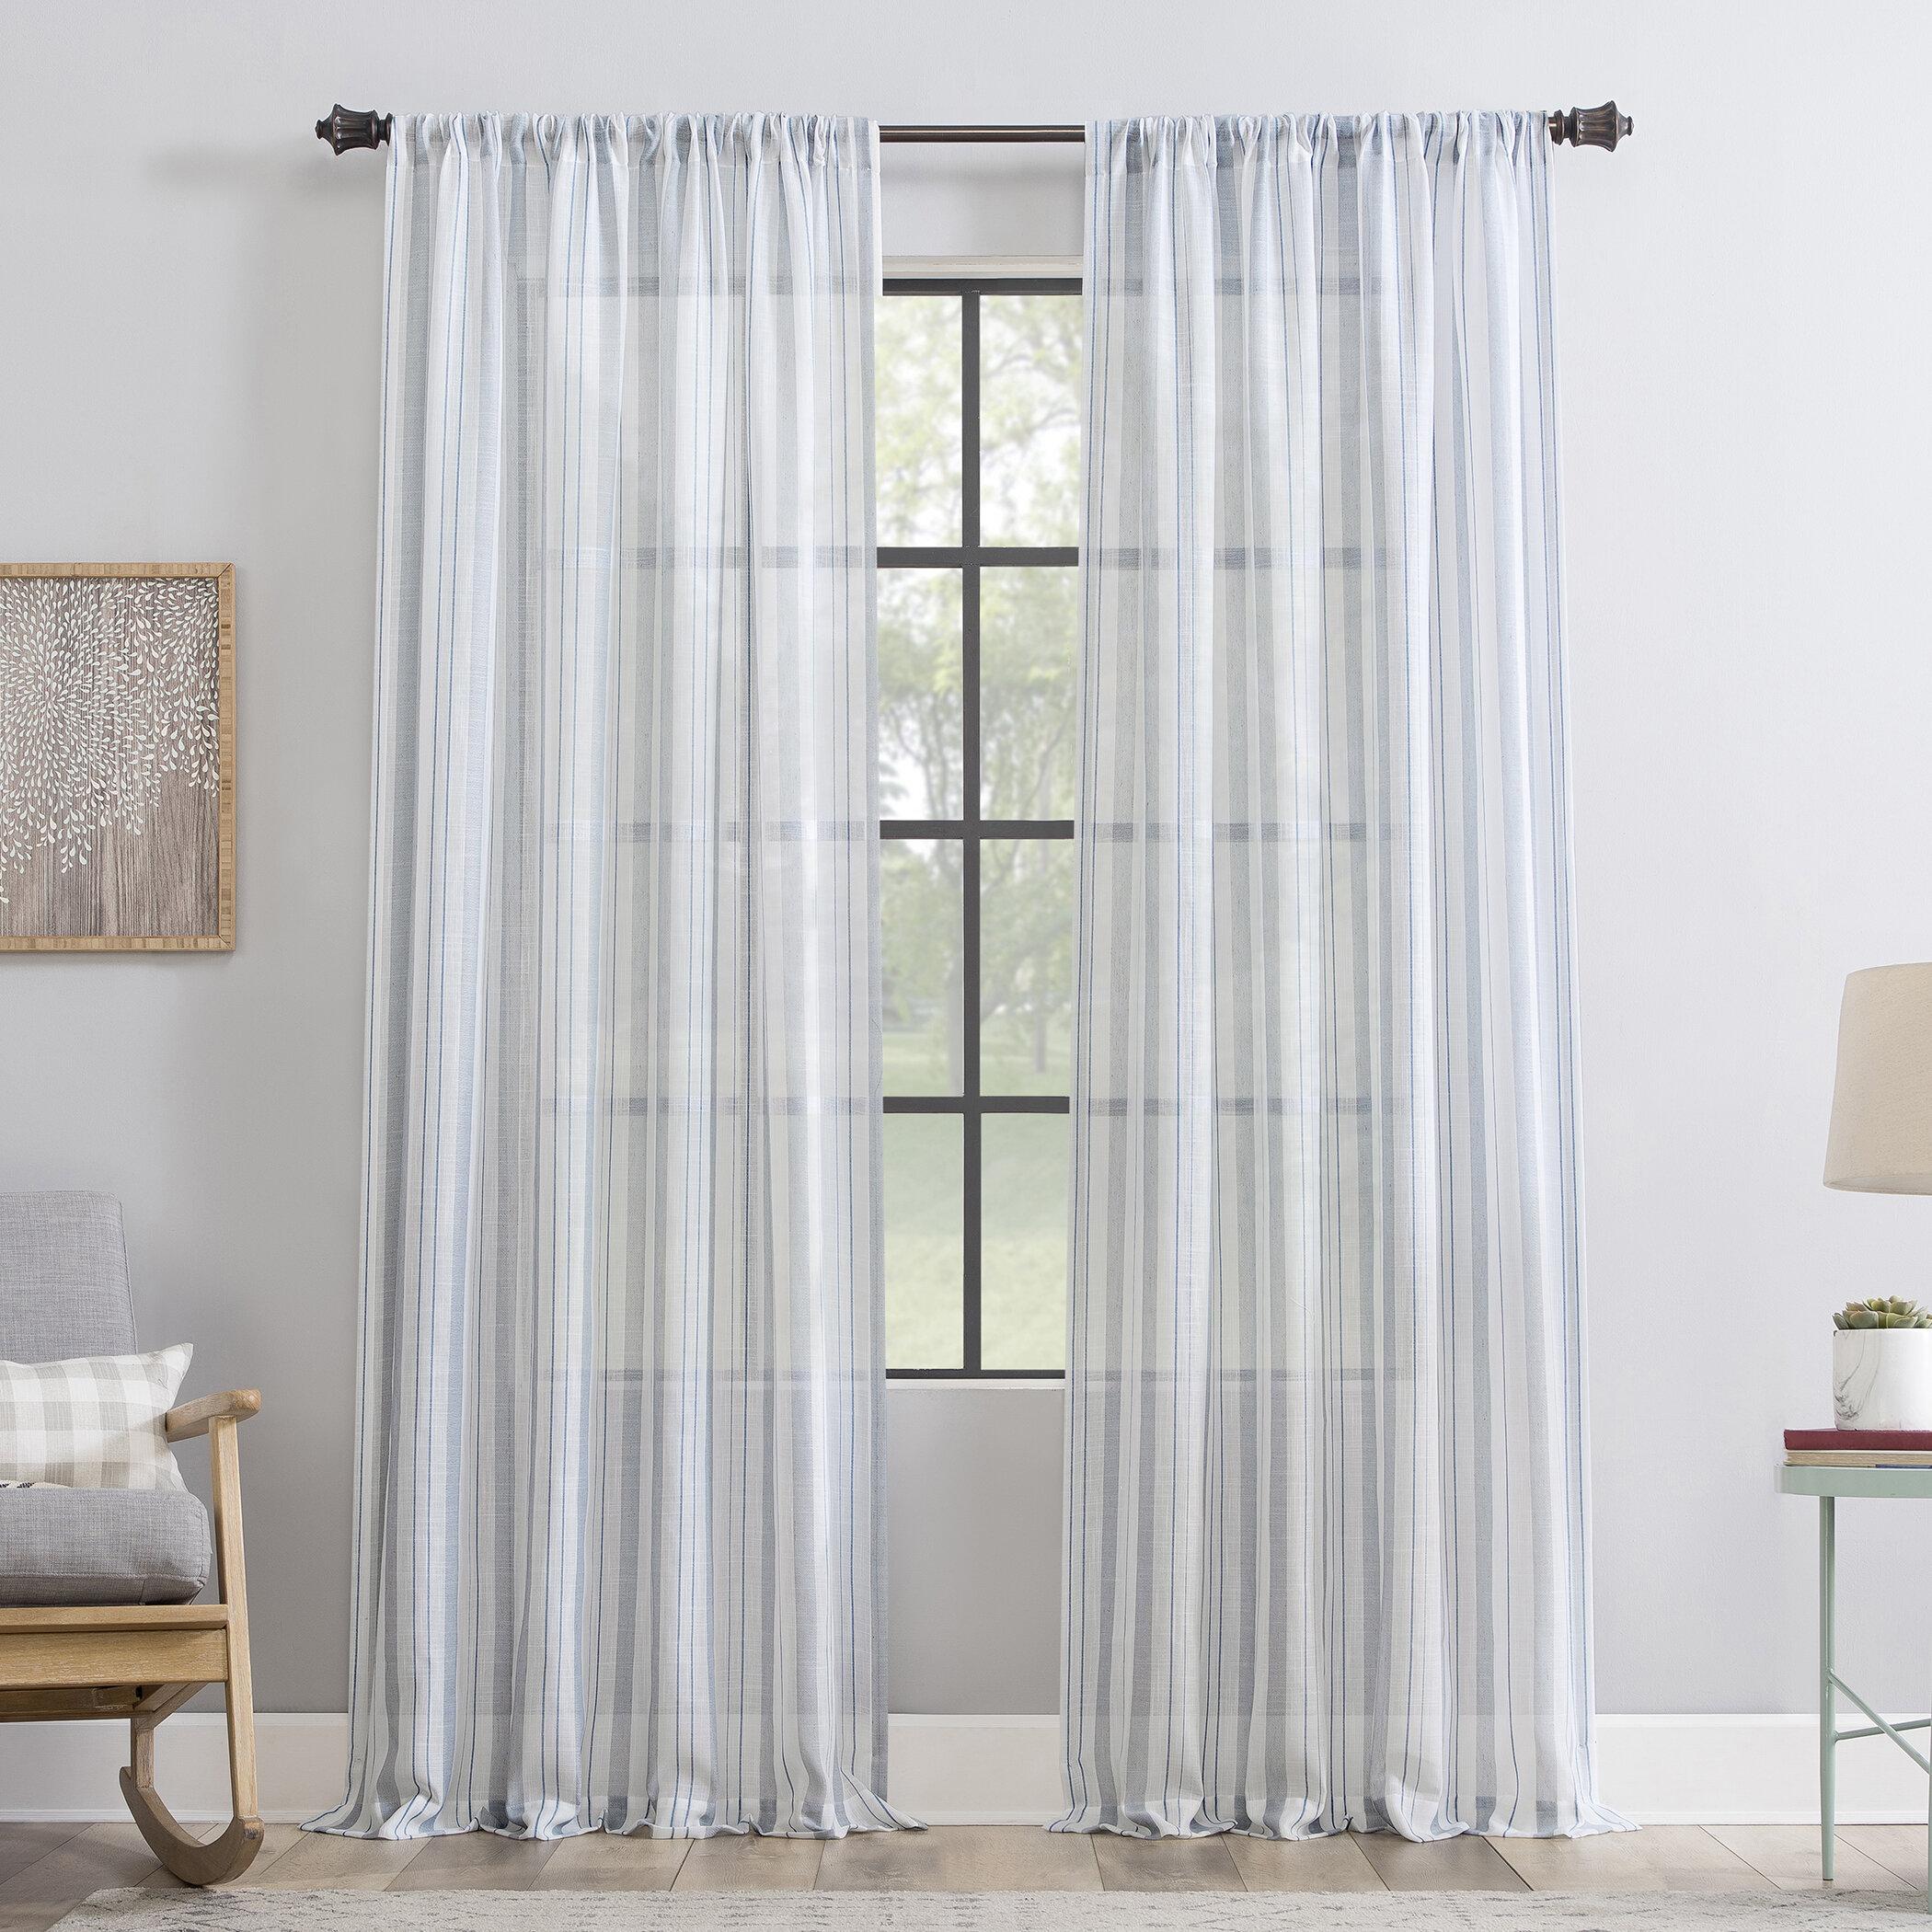 Cleanwindow Striped Sheer Rod Pocket Single Curtain Panel Reviews Wayfair